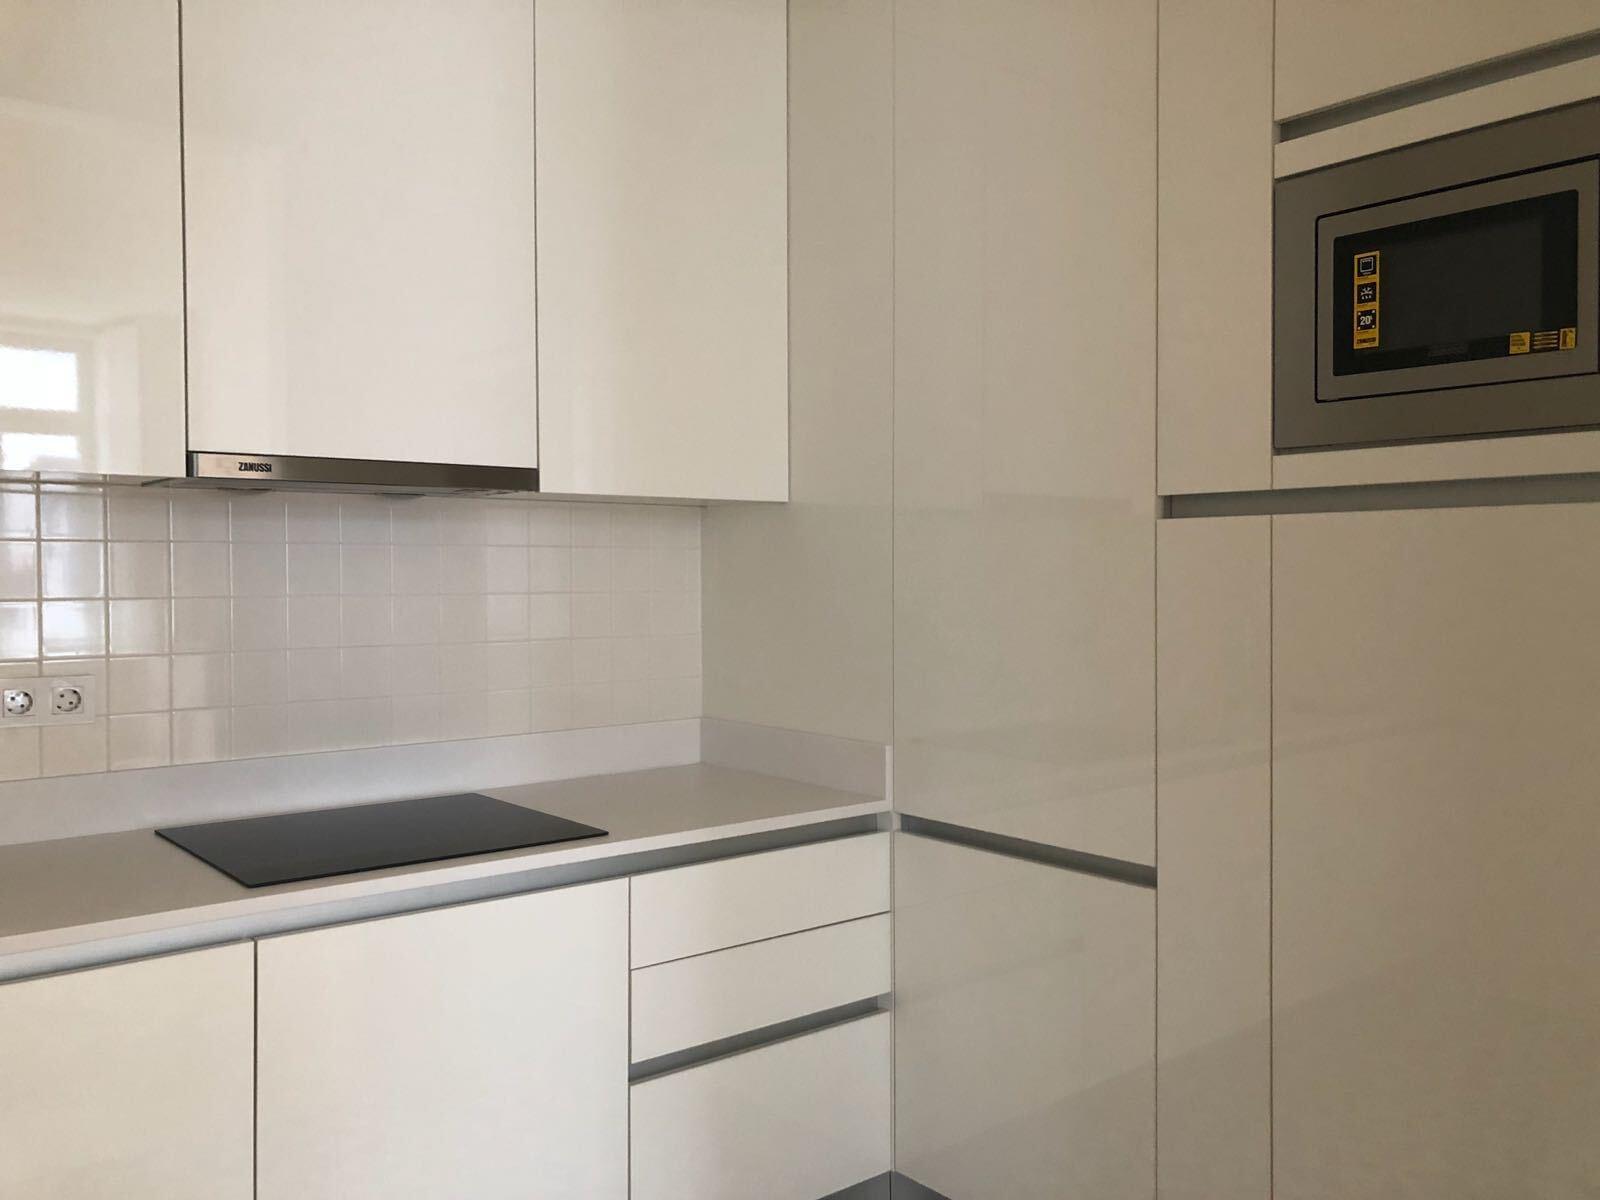 pf17142-apartamento-t2-lisboa-4058a4dc-3a50-4353-ac03-79f169dc5994